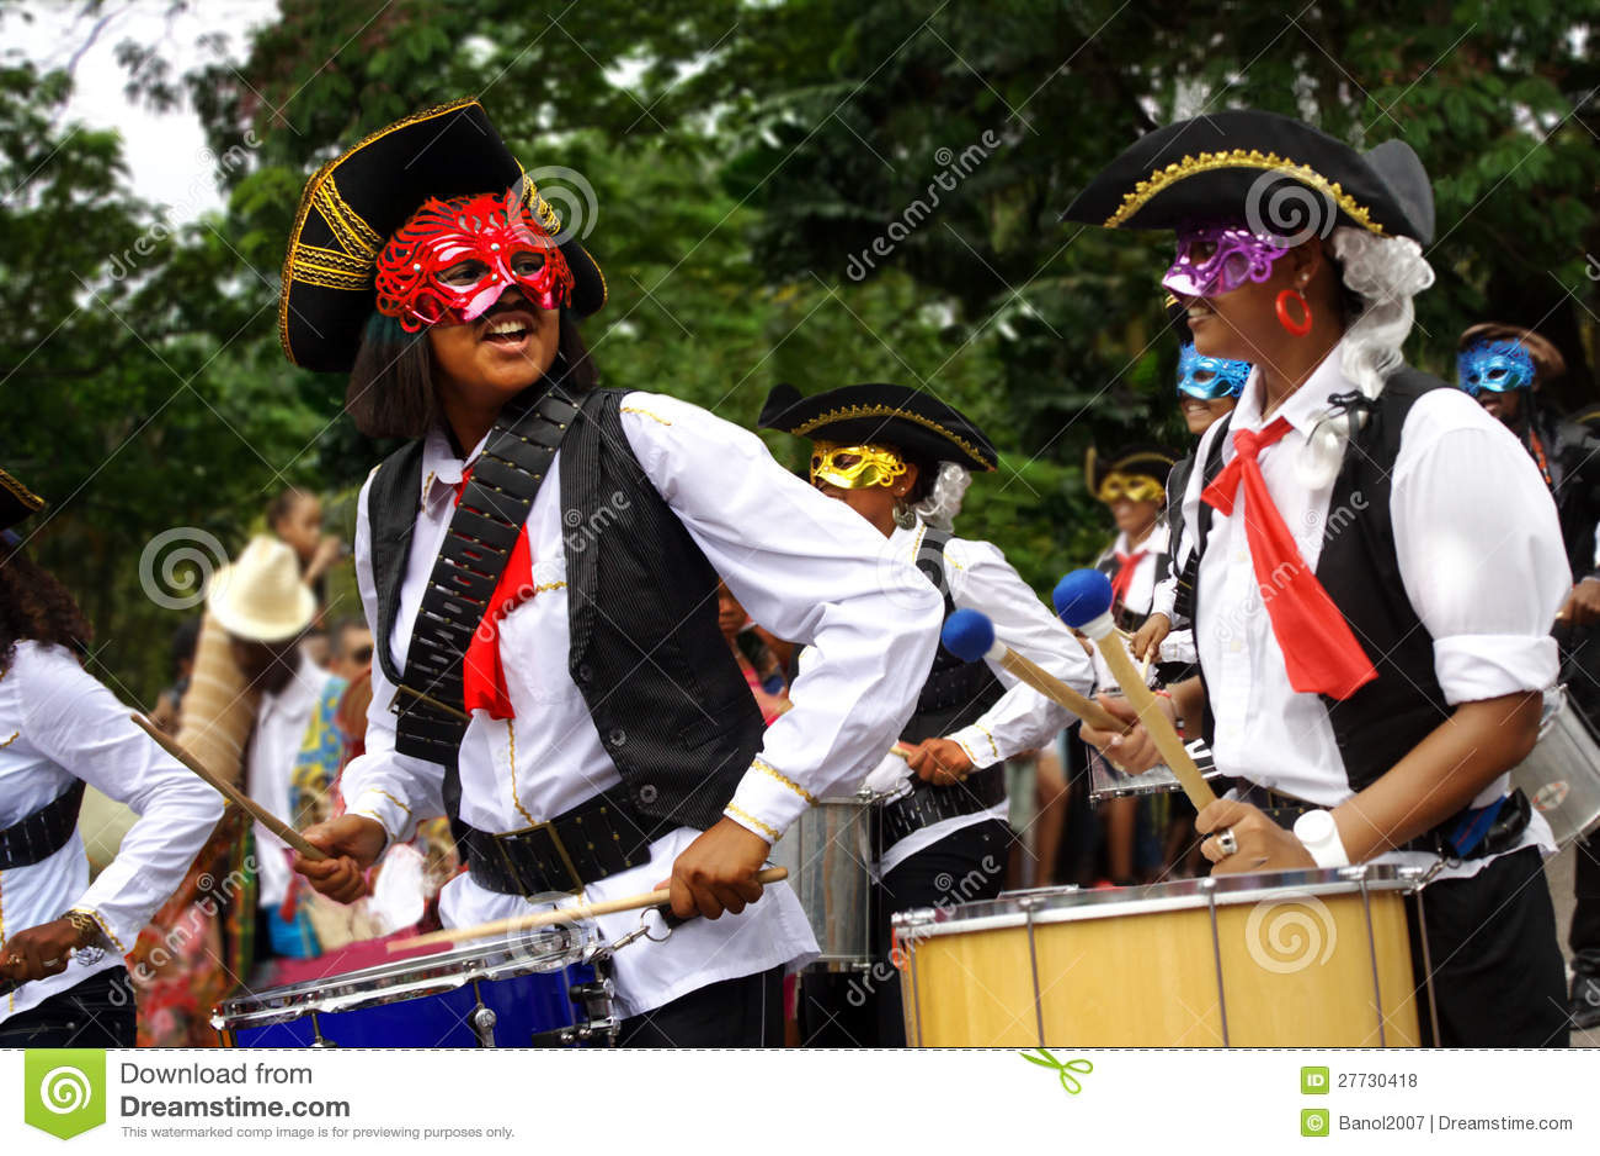 Lustige Piratenarmee mit Trommelwillkommenskarneval